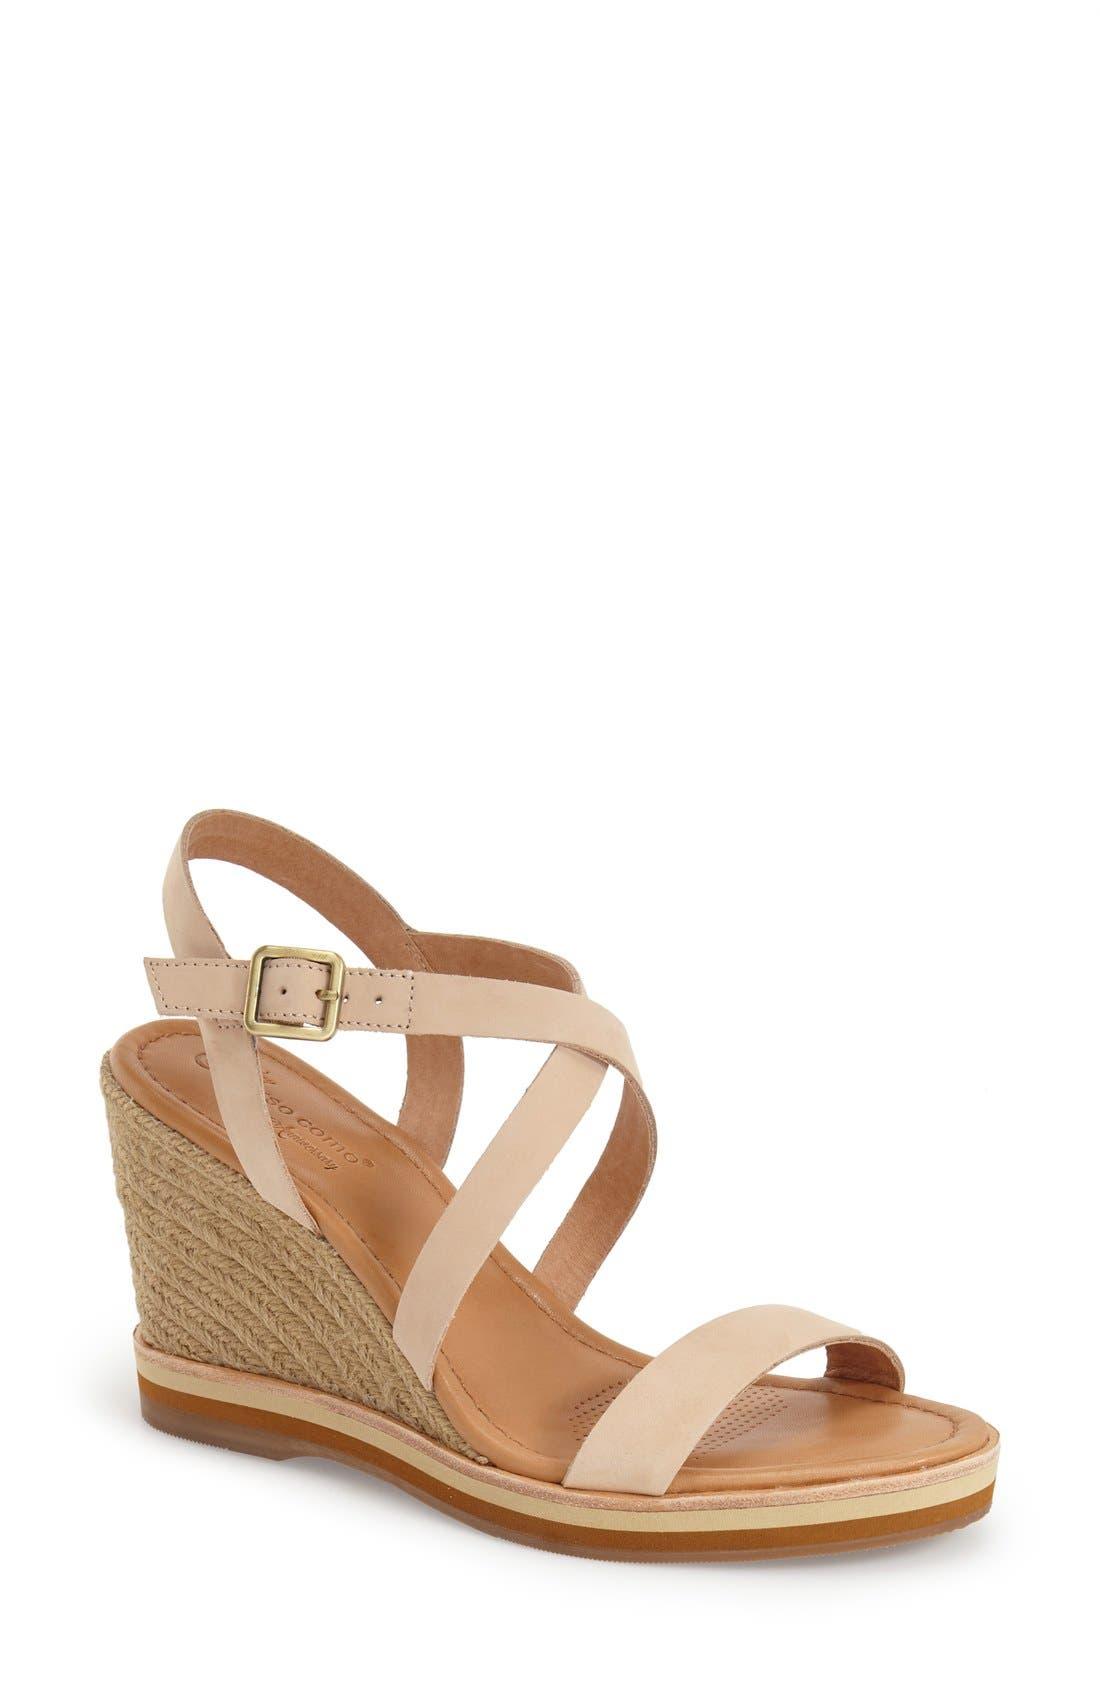 Alternate Image 1 Selected - Corso Como 'Gladis' Espadrille Wedge Sandal (Women)